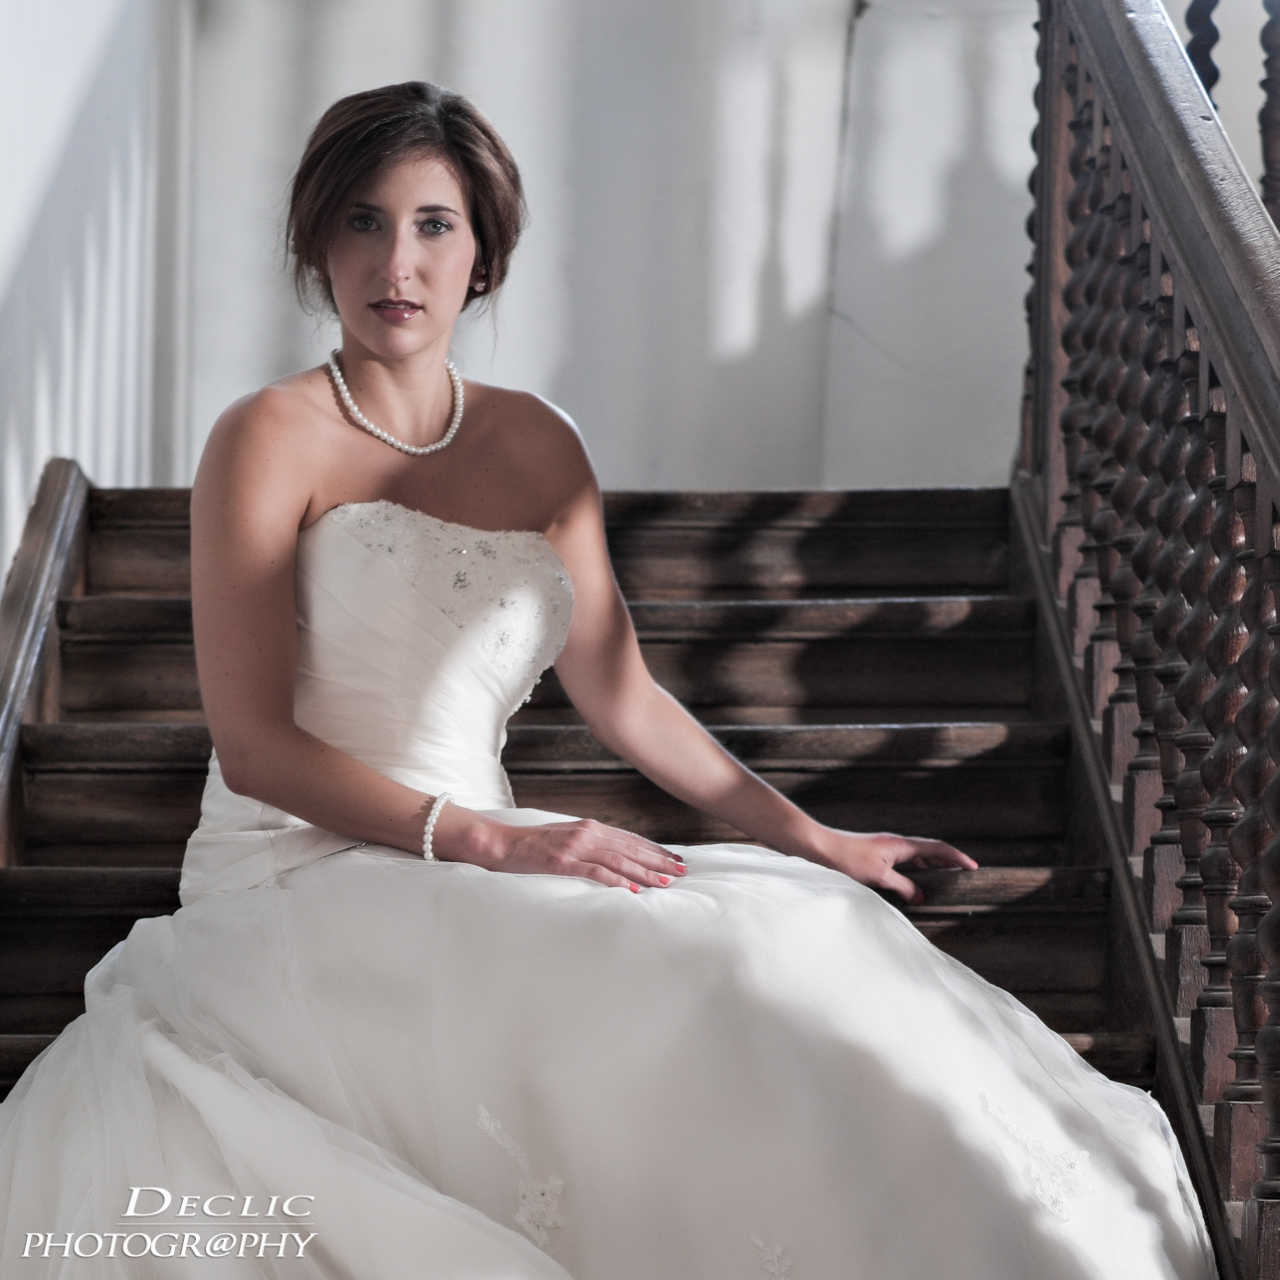 wedding portrait photo declic photography